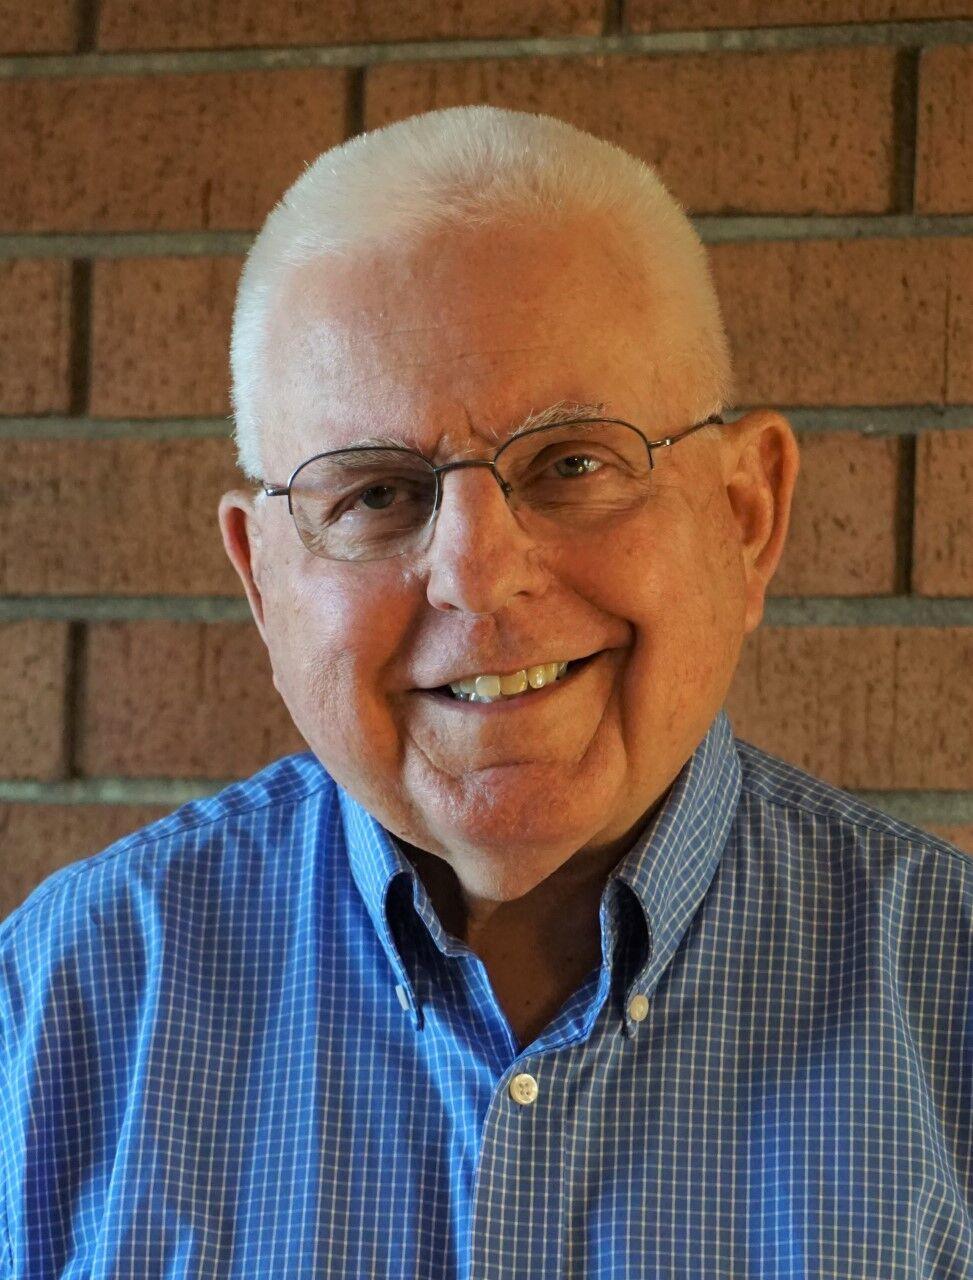 Doug Olson